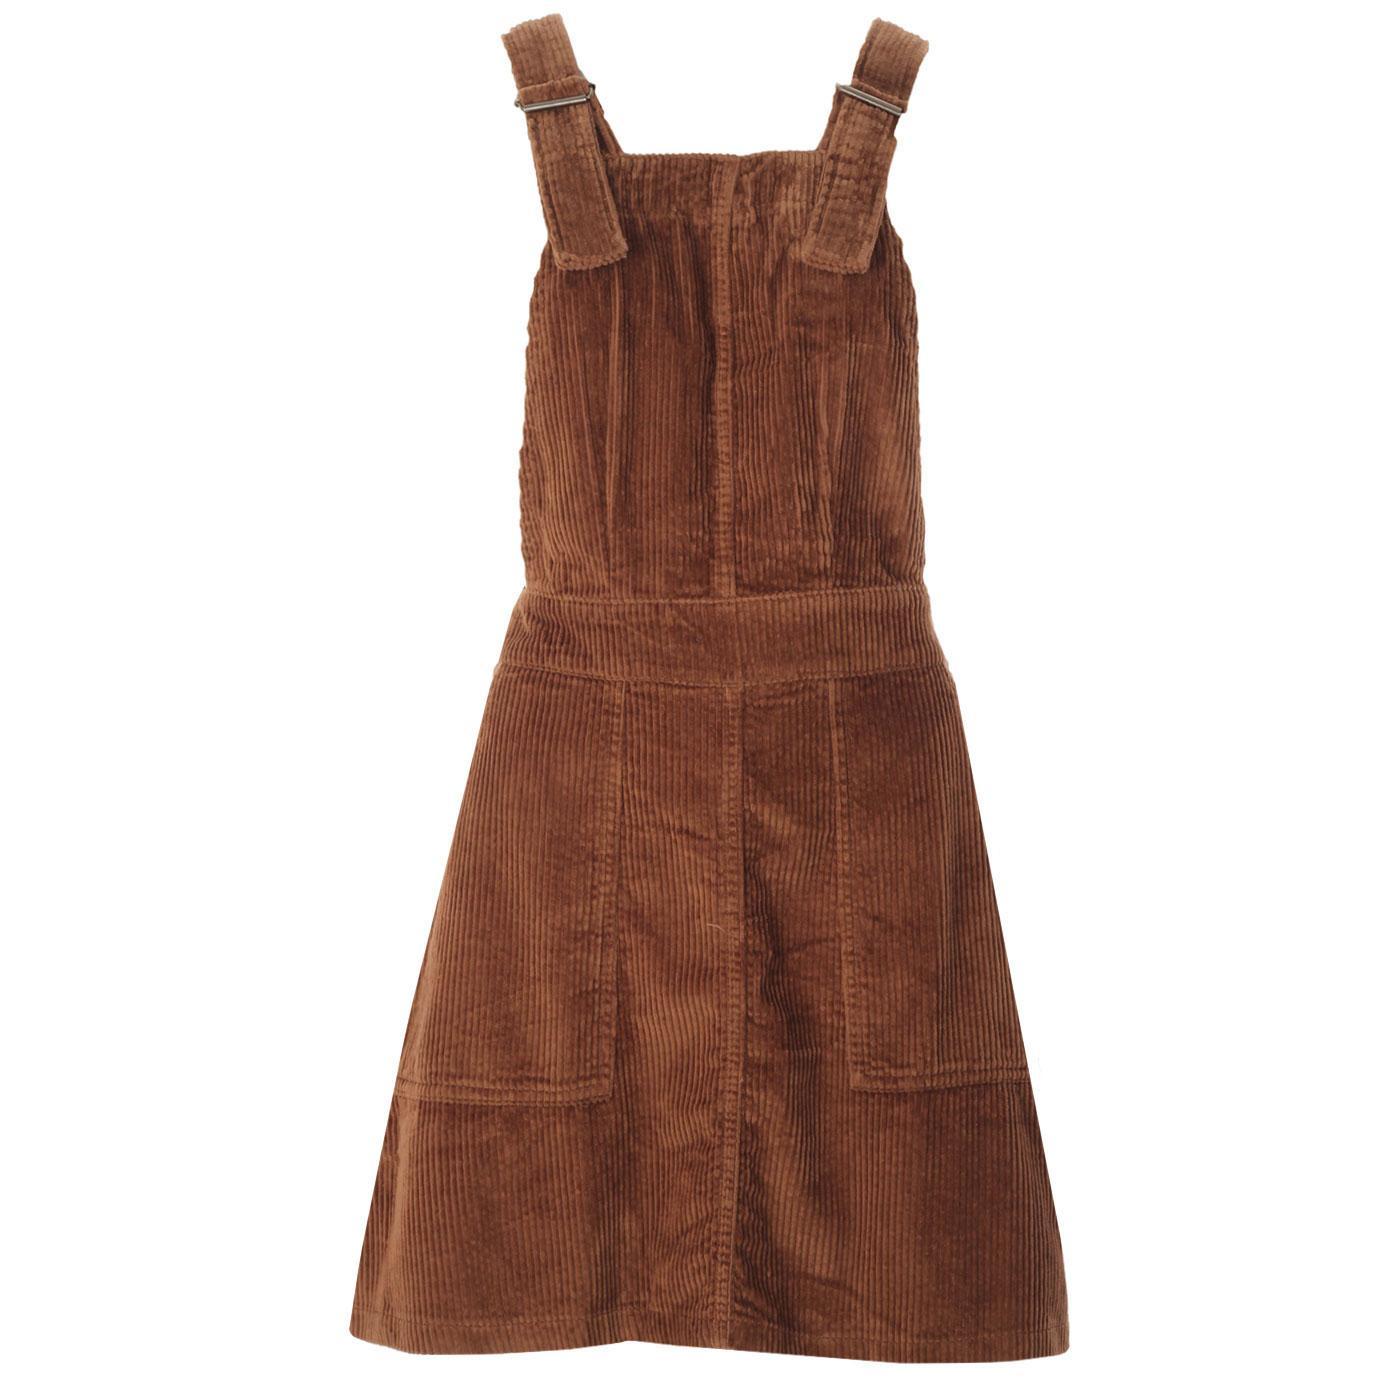 Madcap England Retro 60s Jumbo Cord Pinafore Dress in Toffee